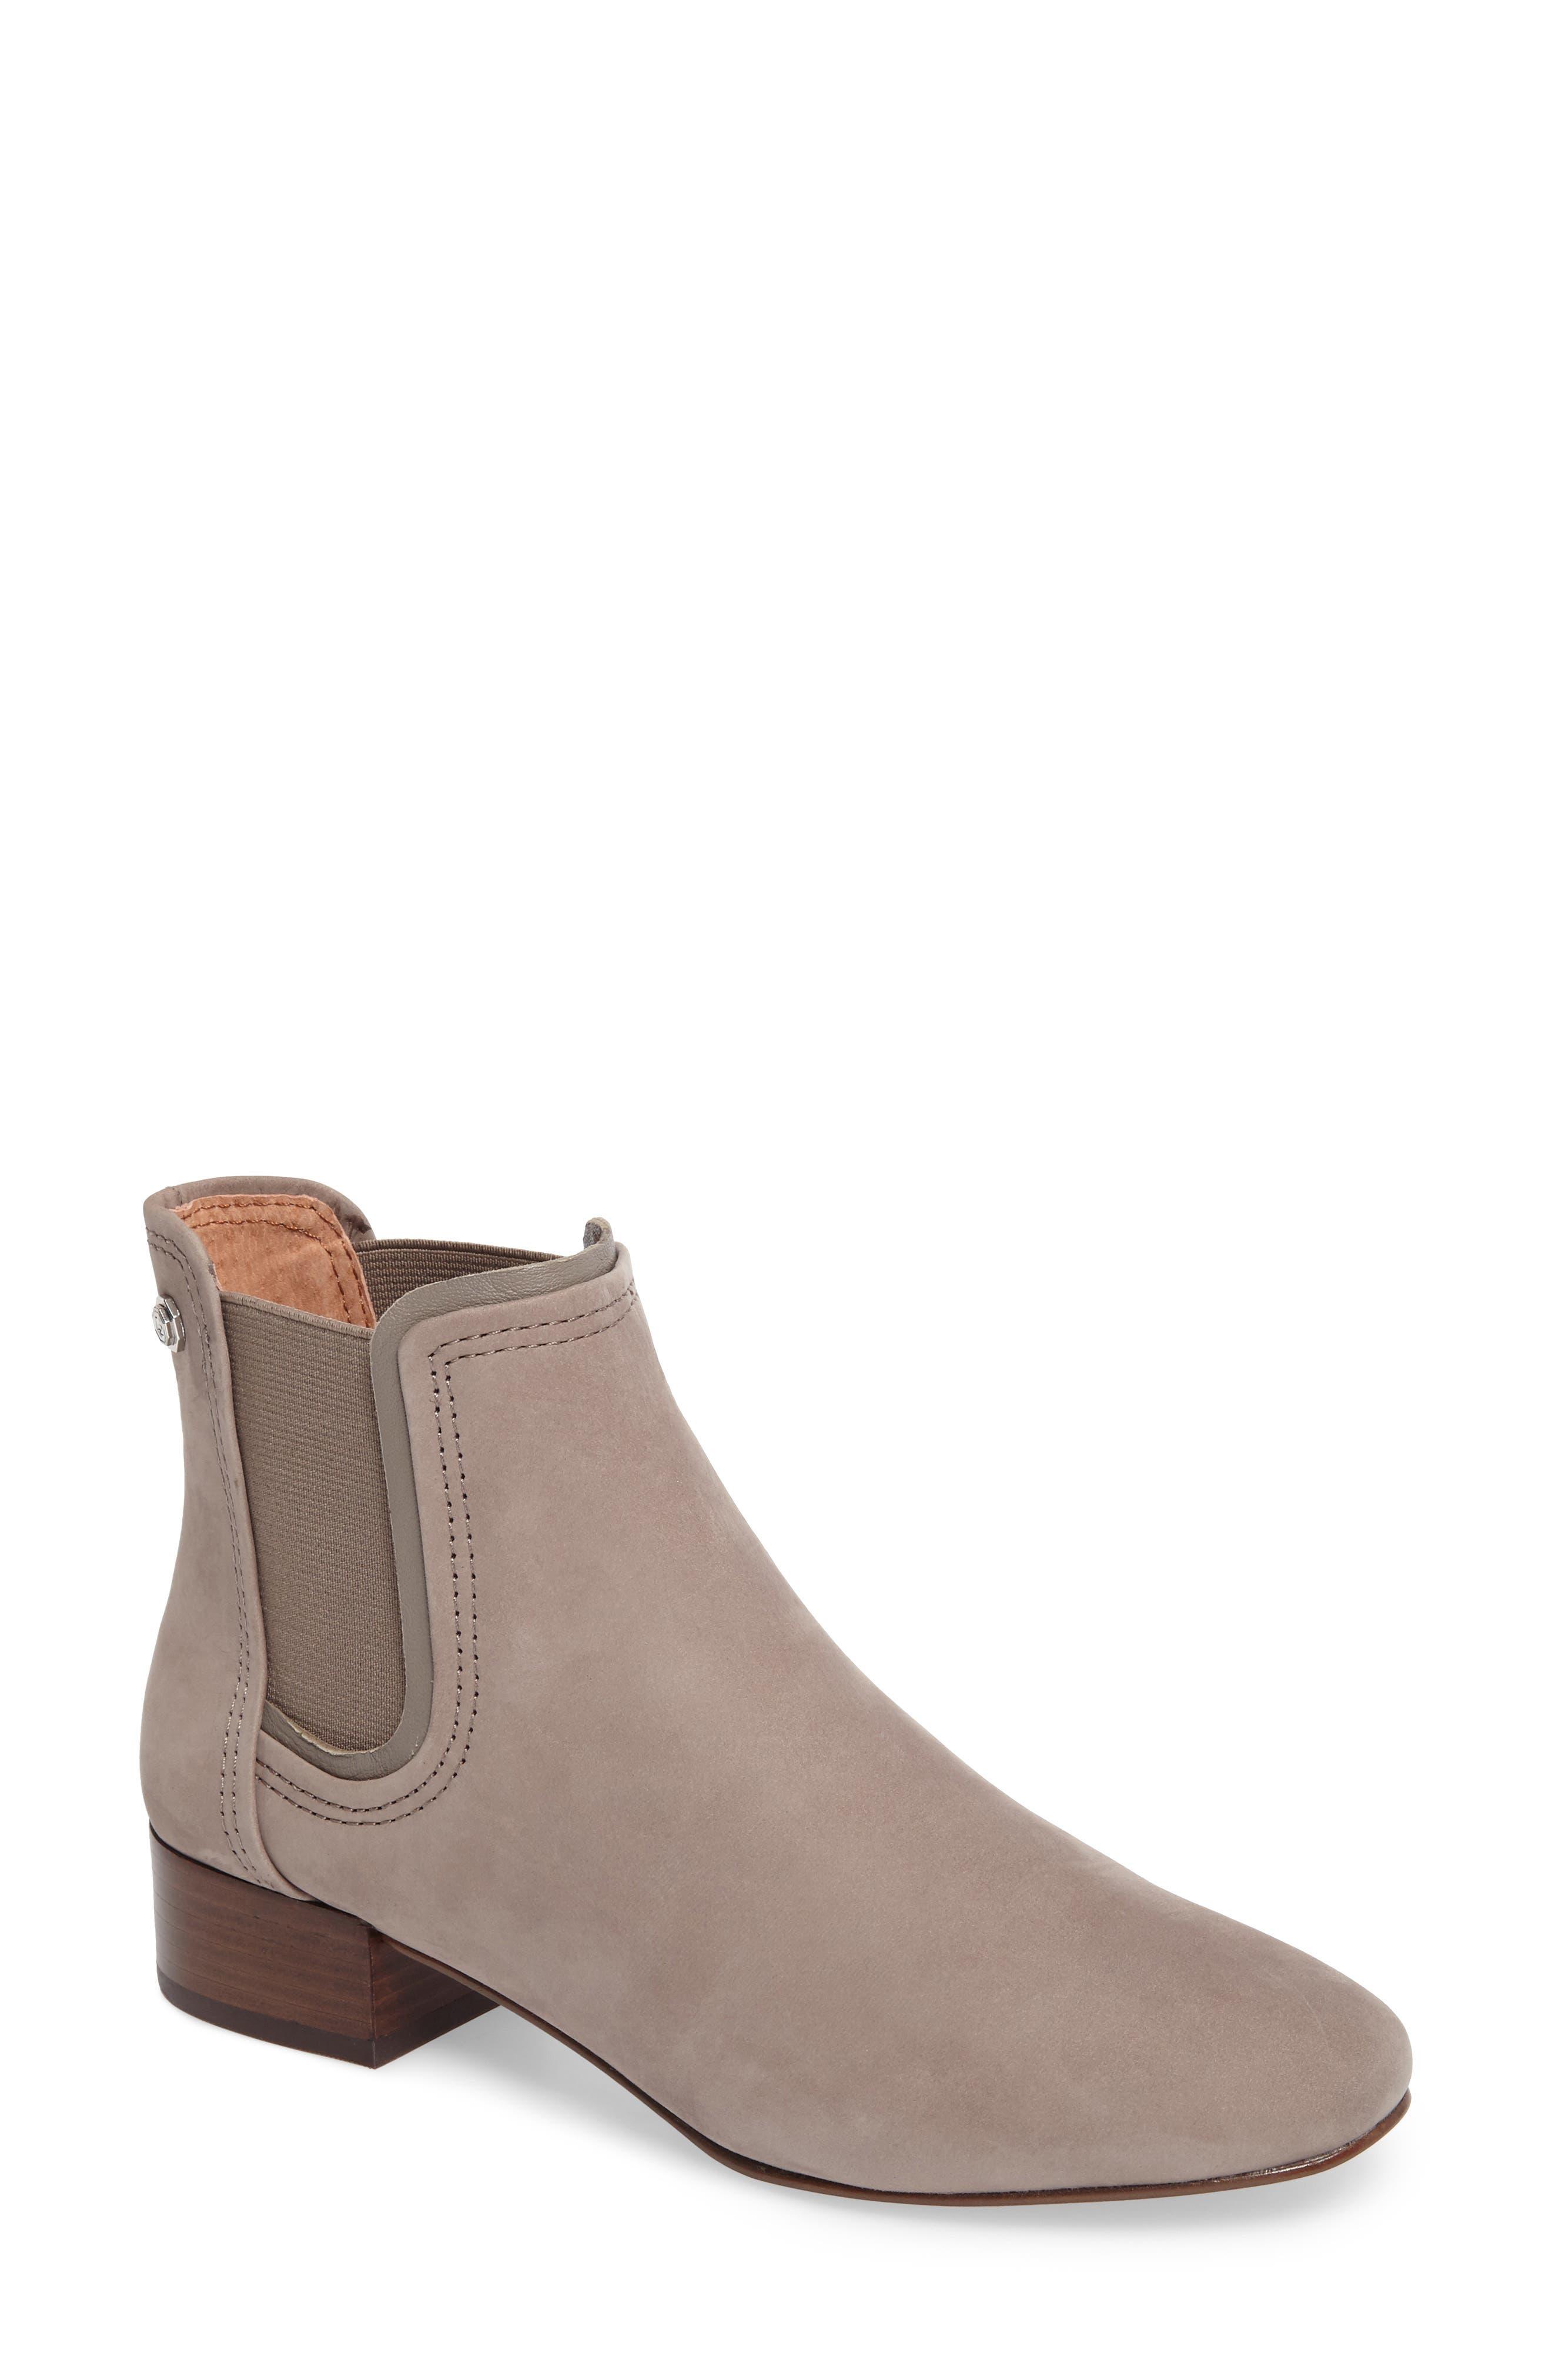 Waldon Chelsea Boot,                         Main,                         color, Gravel Leather